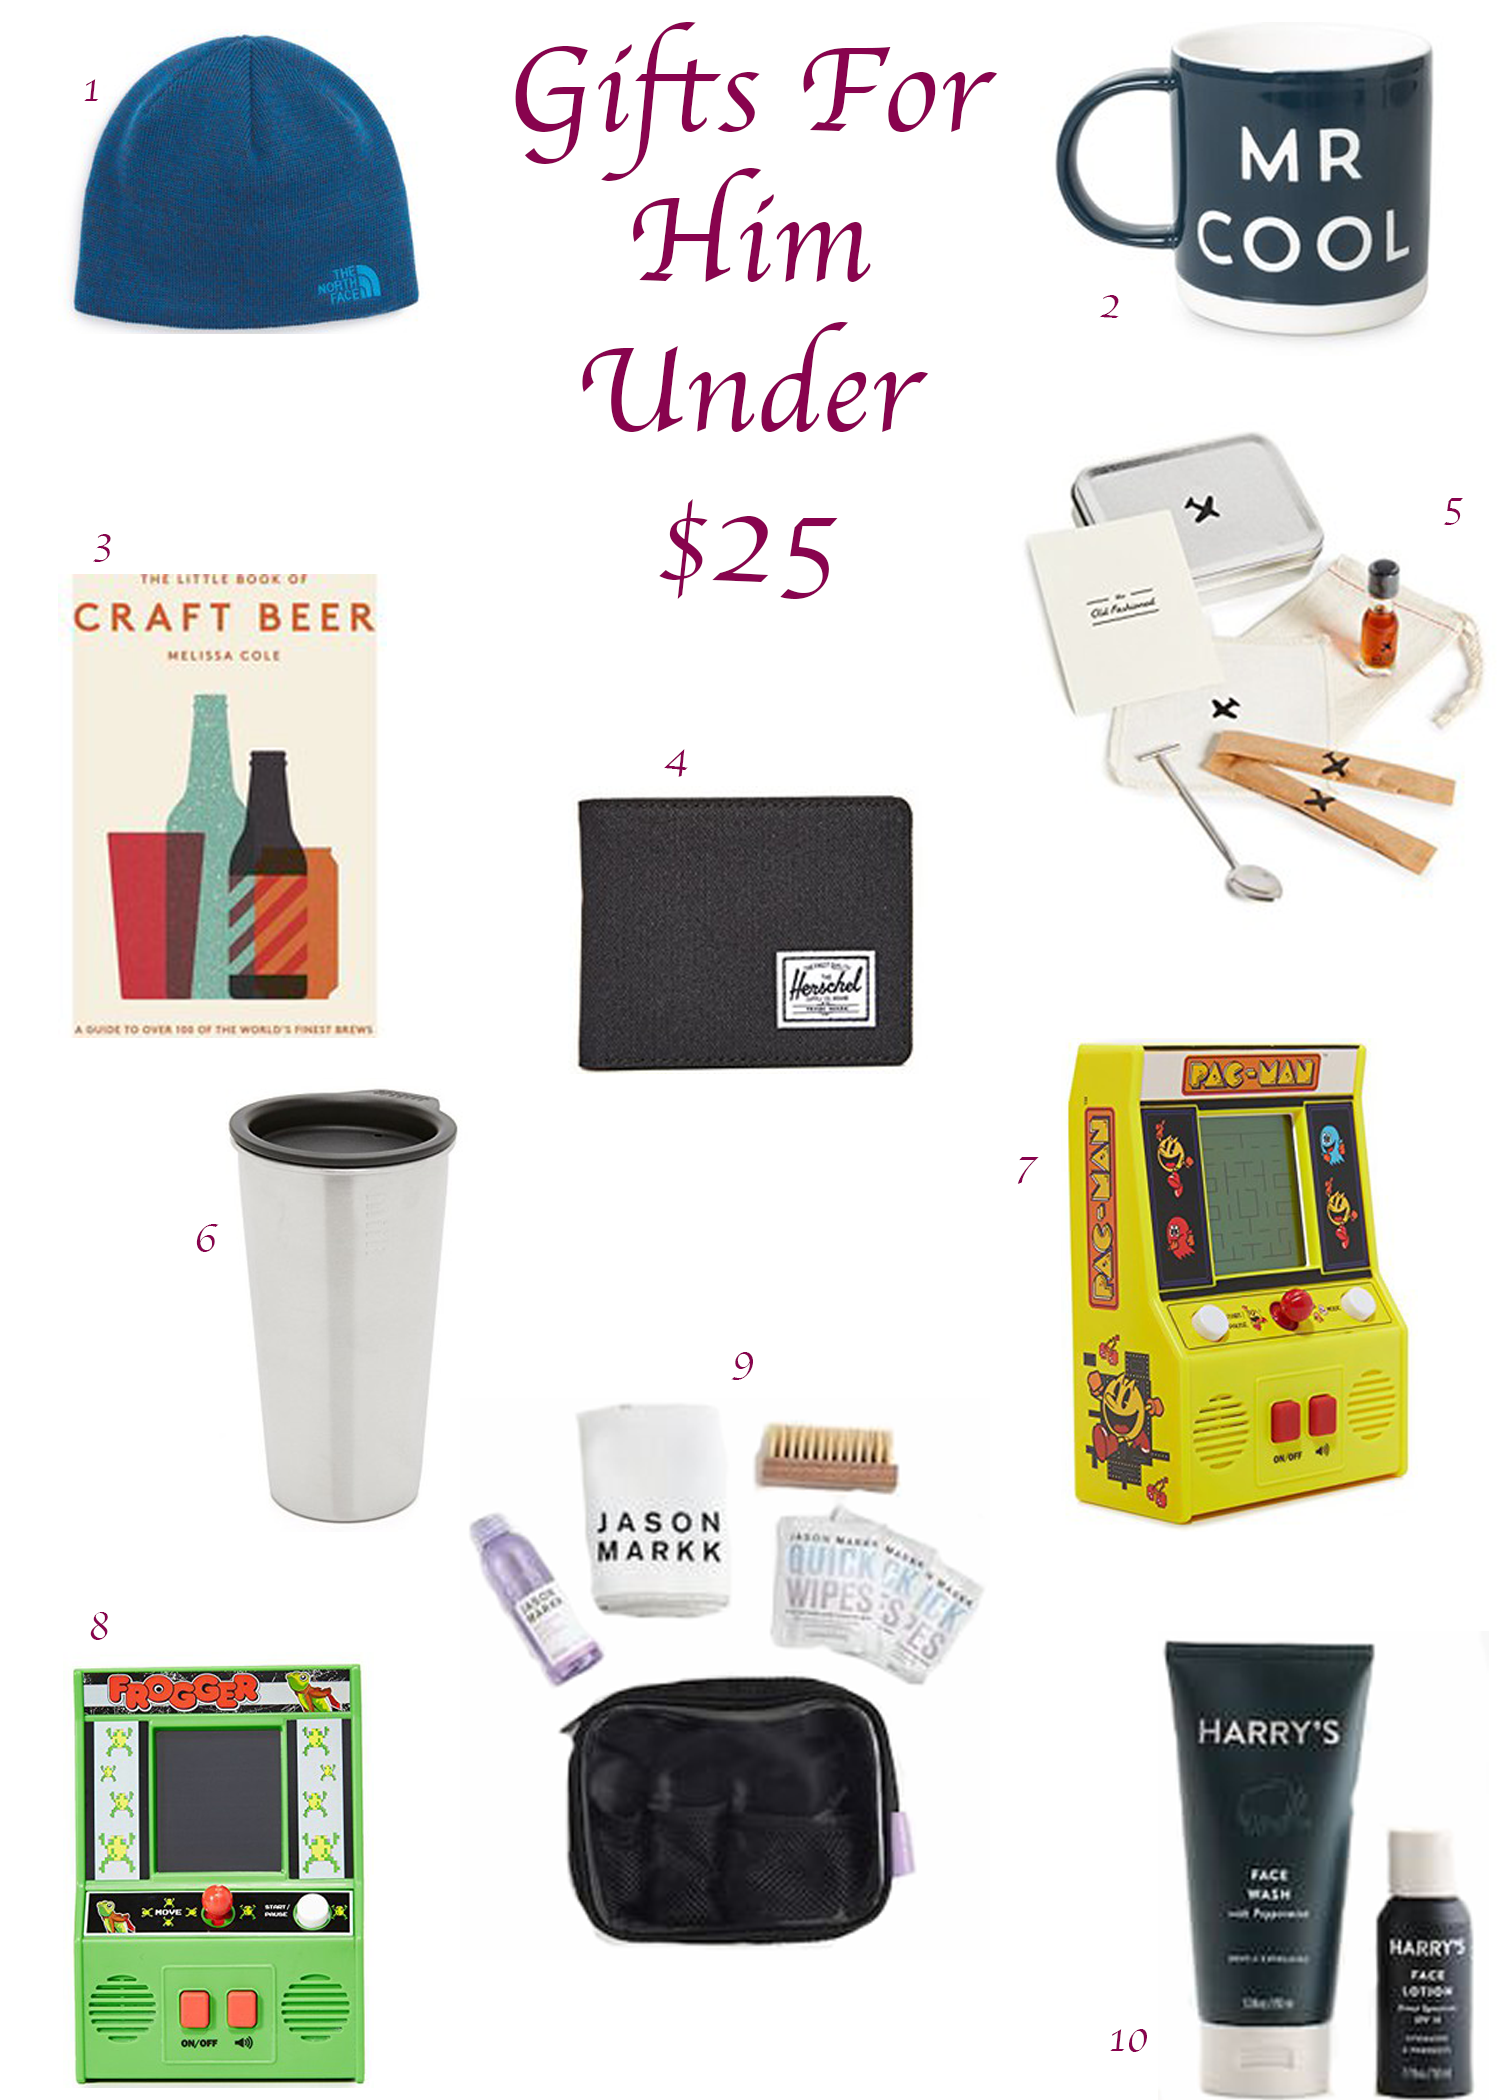 Gifts For Him Under $25 - Effortlessly Sophisticated - Metro